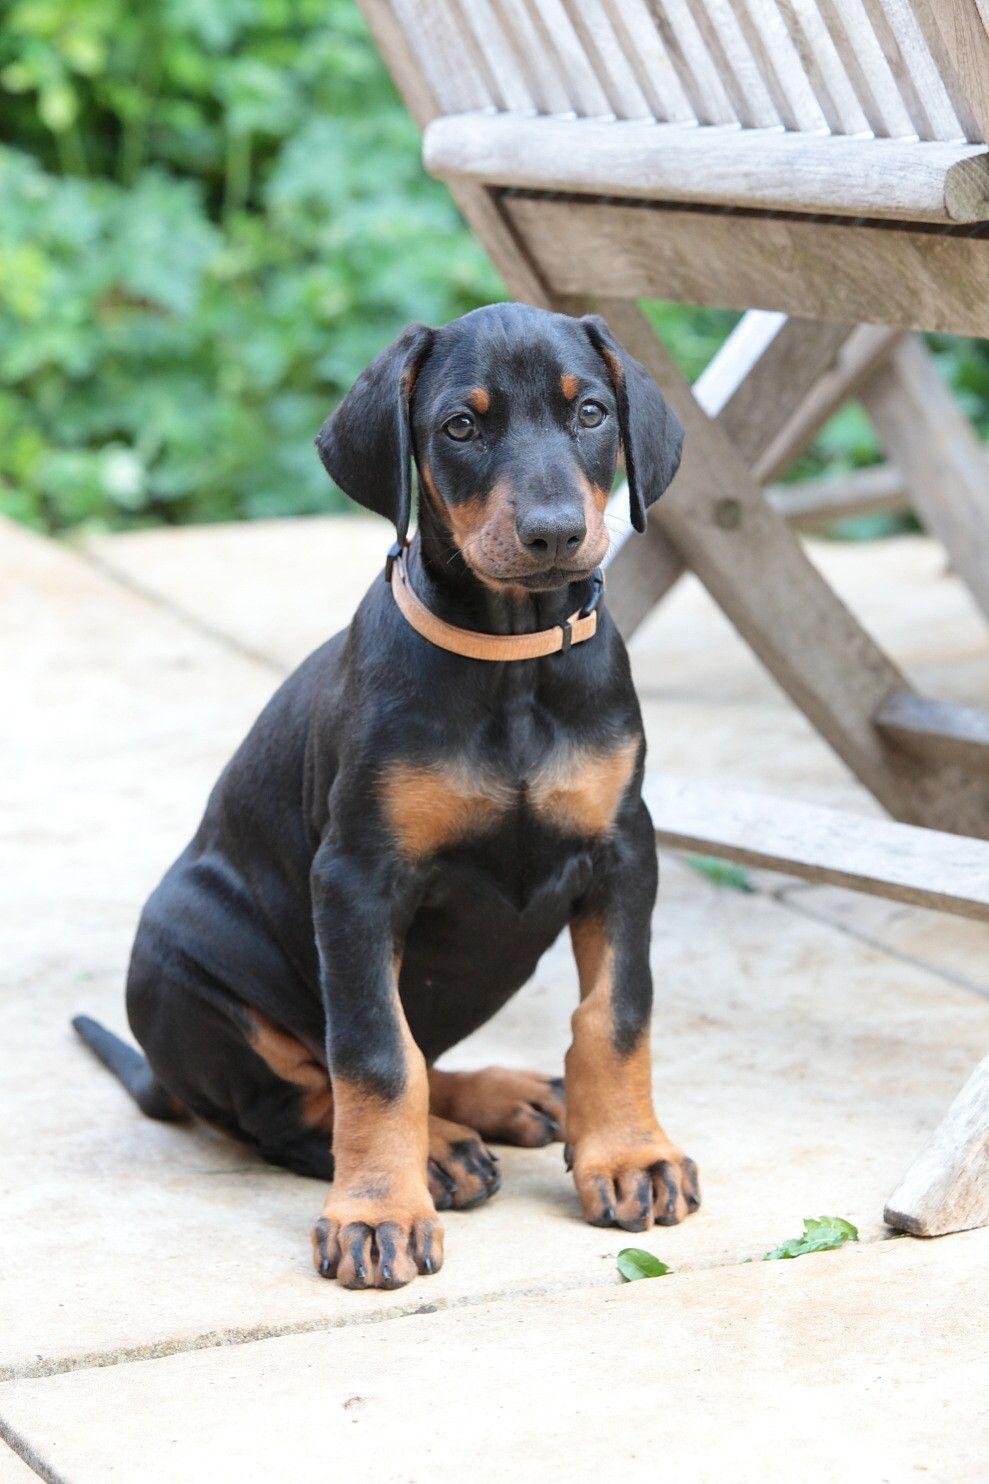 Doberman Puppy Train A Dog To Sit Lie Rollover Stand Fetch